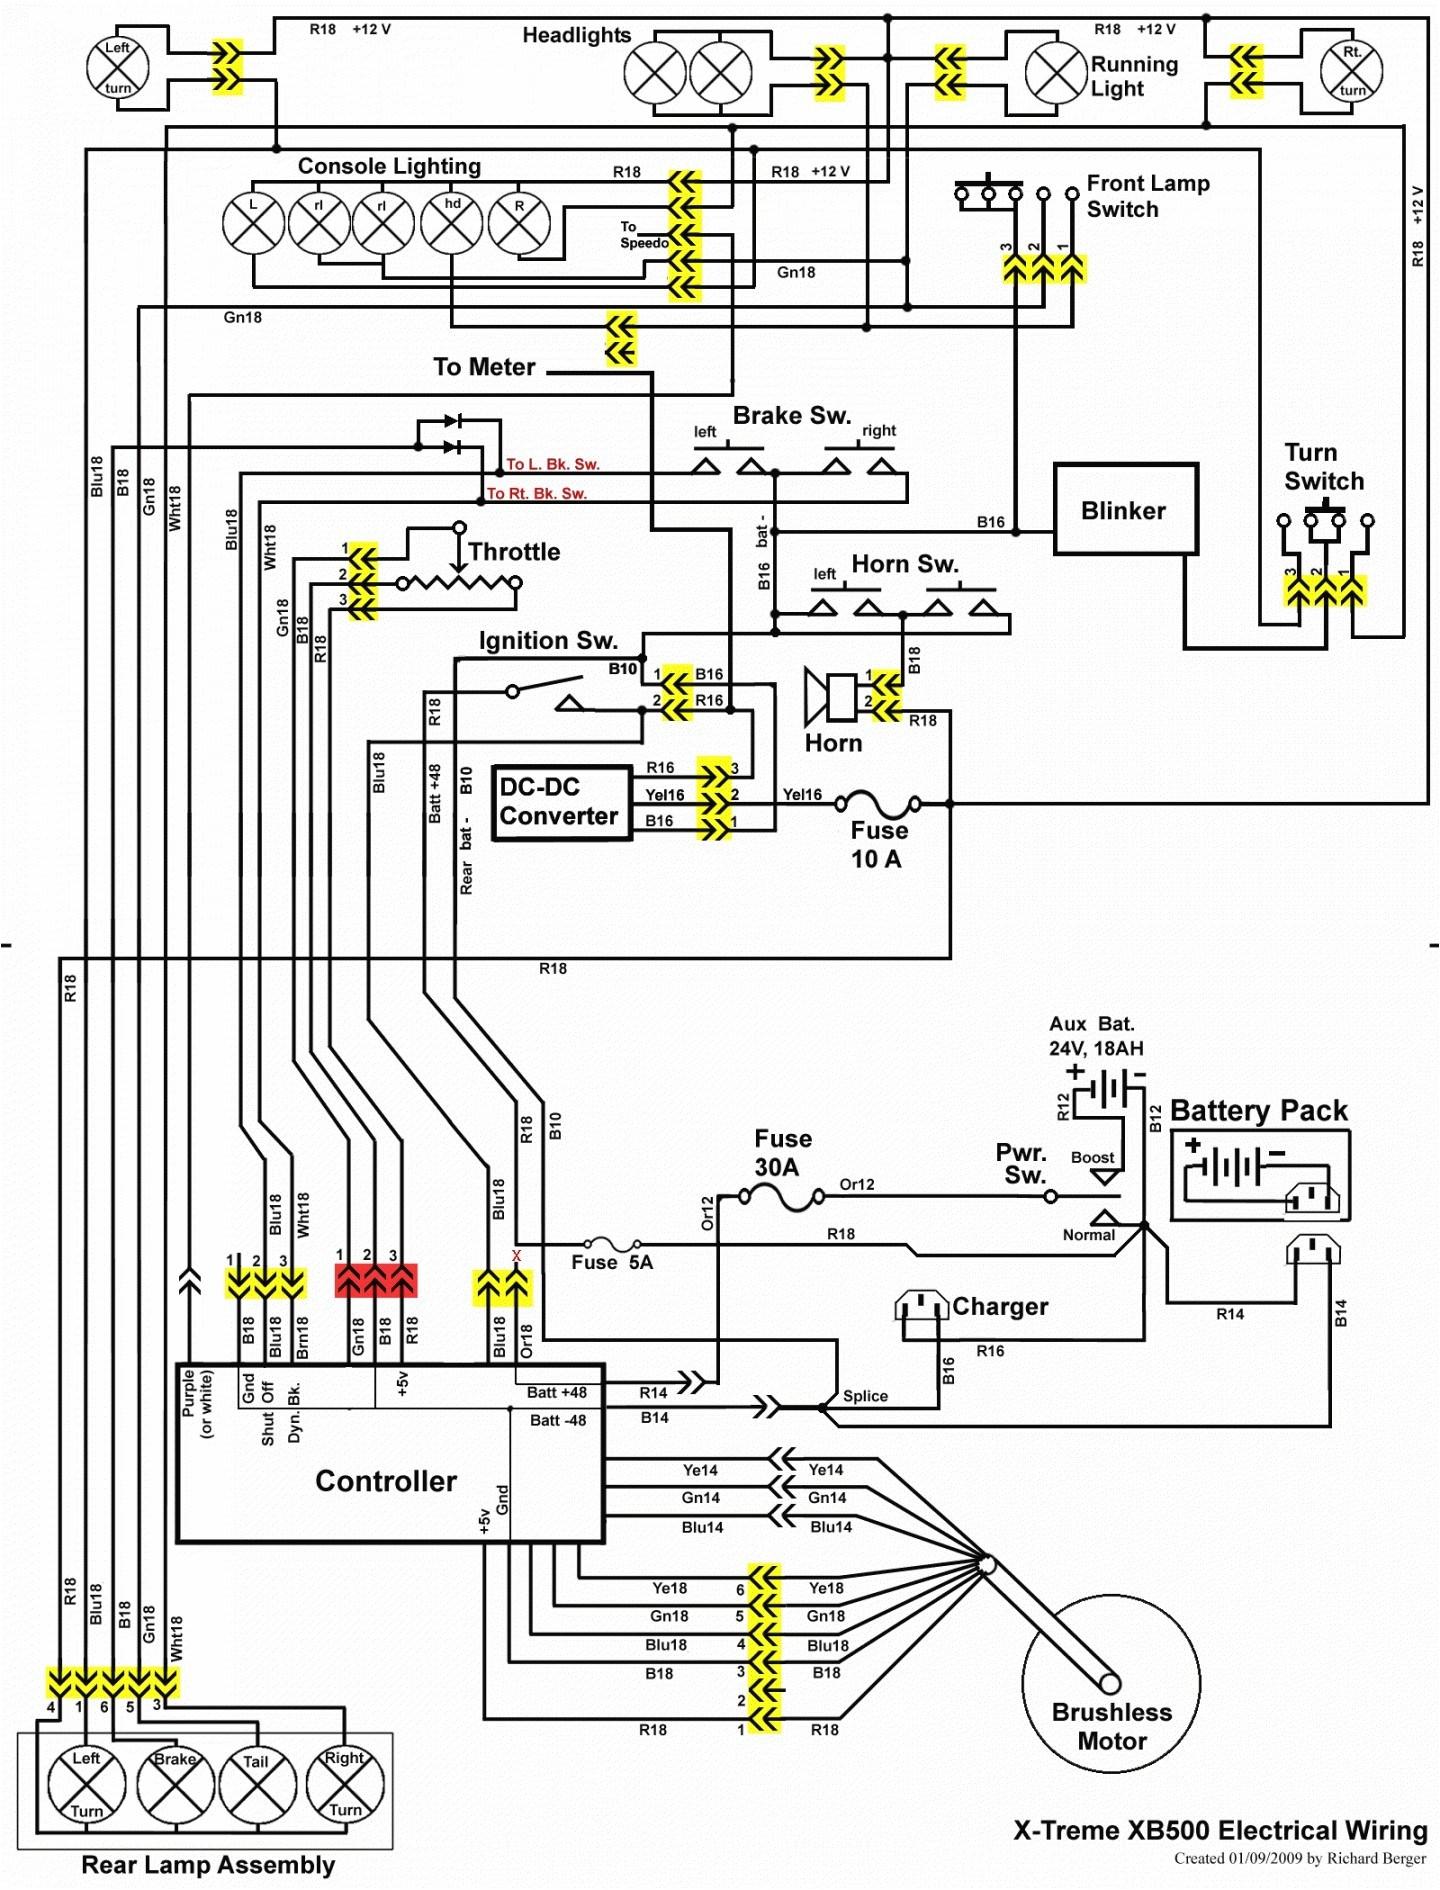 taotao wiring diagrams 50cc wiring diagram world 50cc scooter wiring schematic wiring diagram taotao scooter wiring